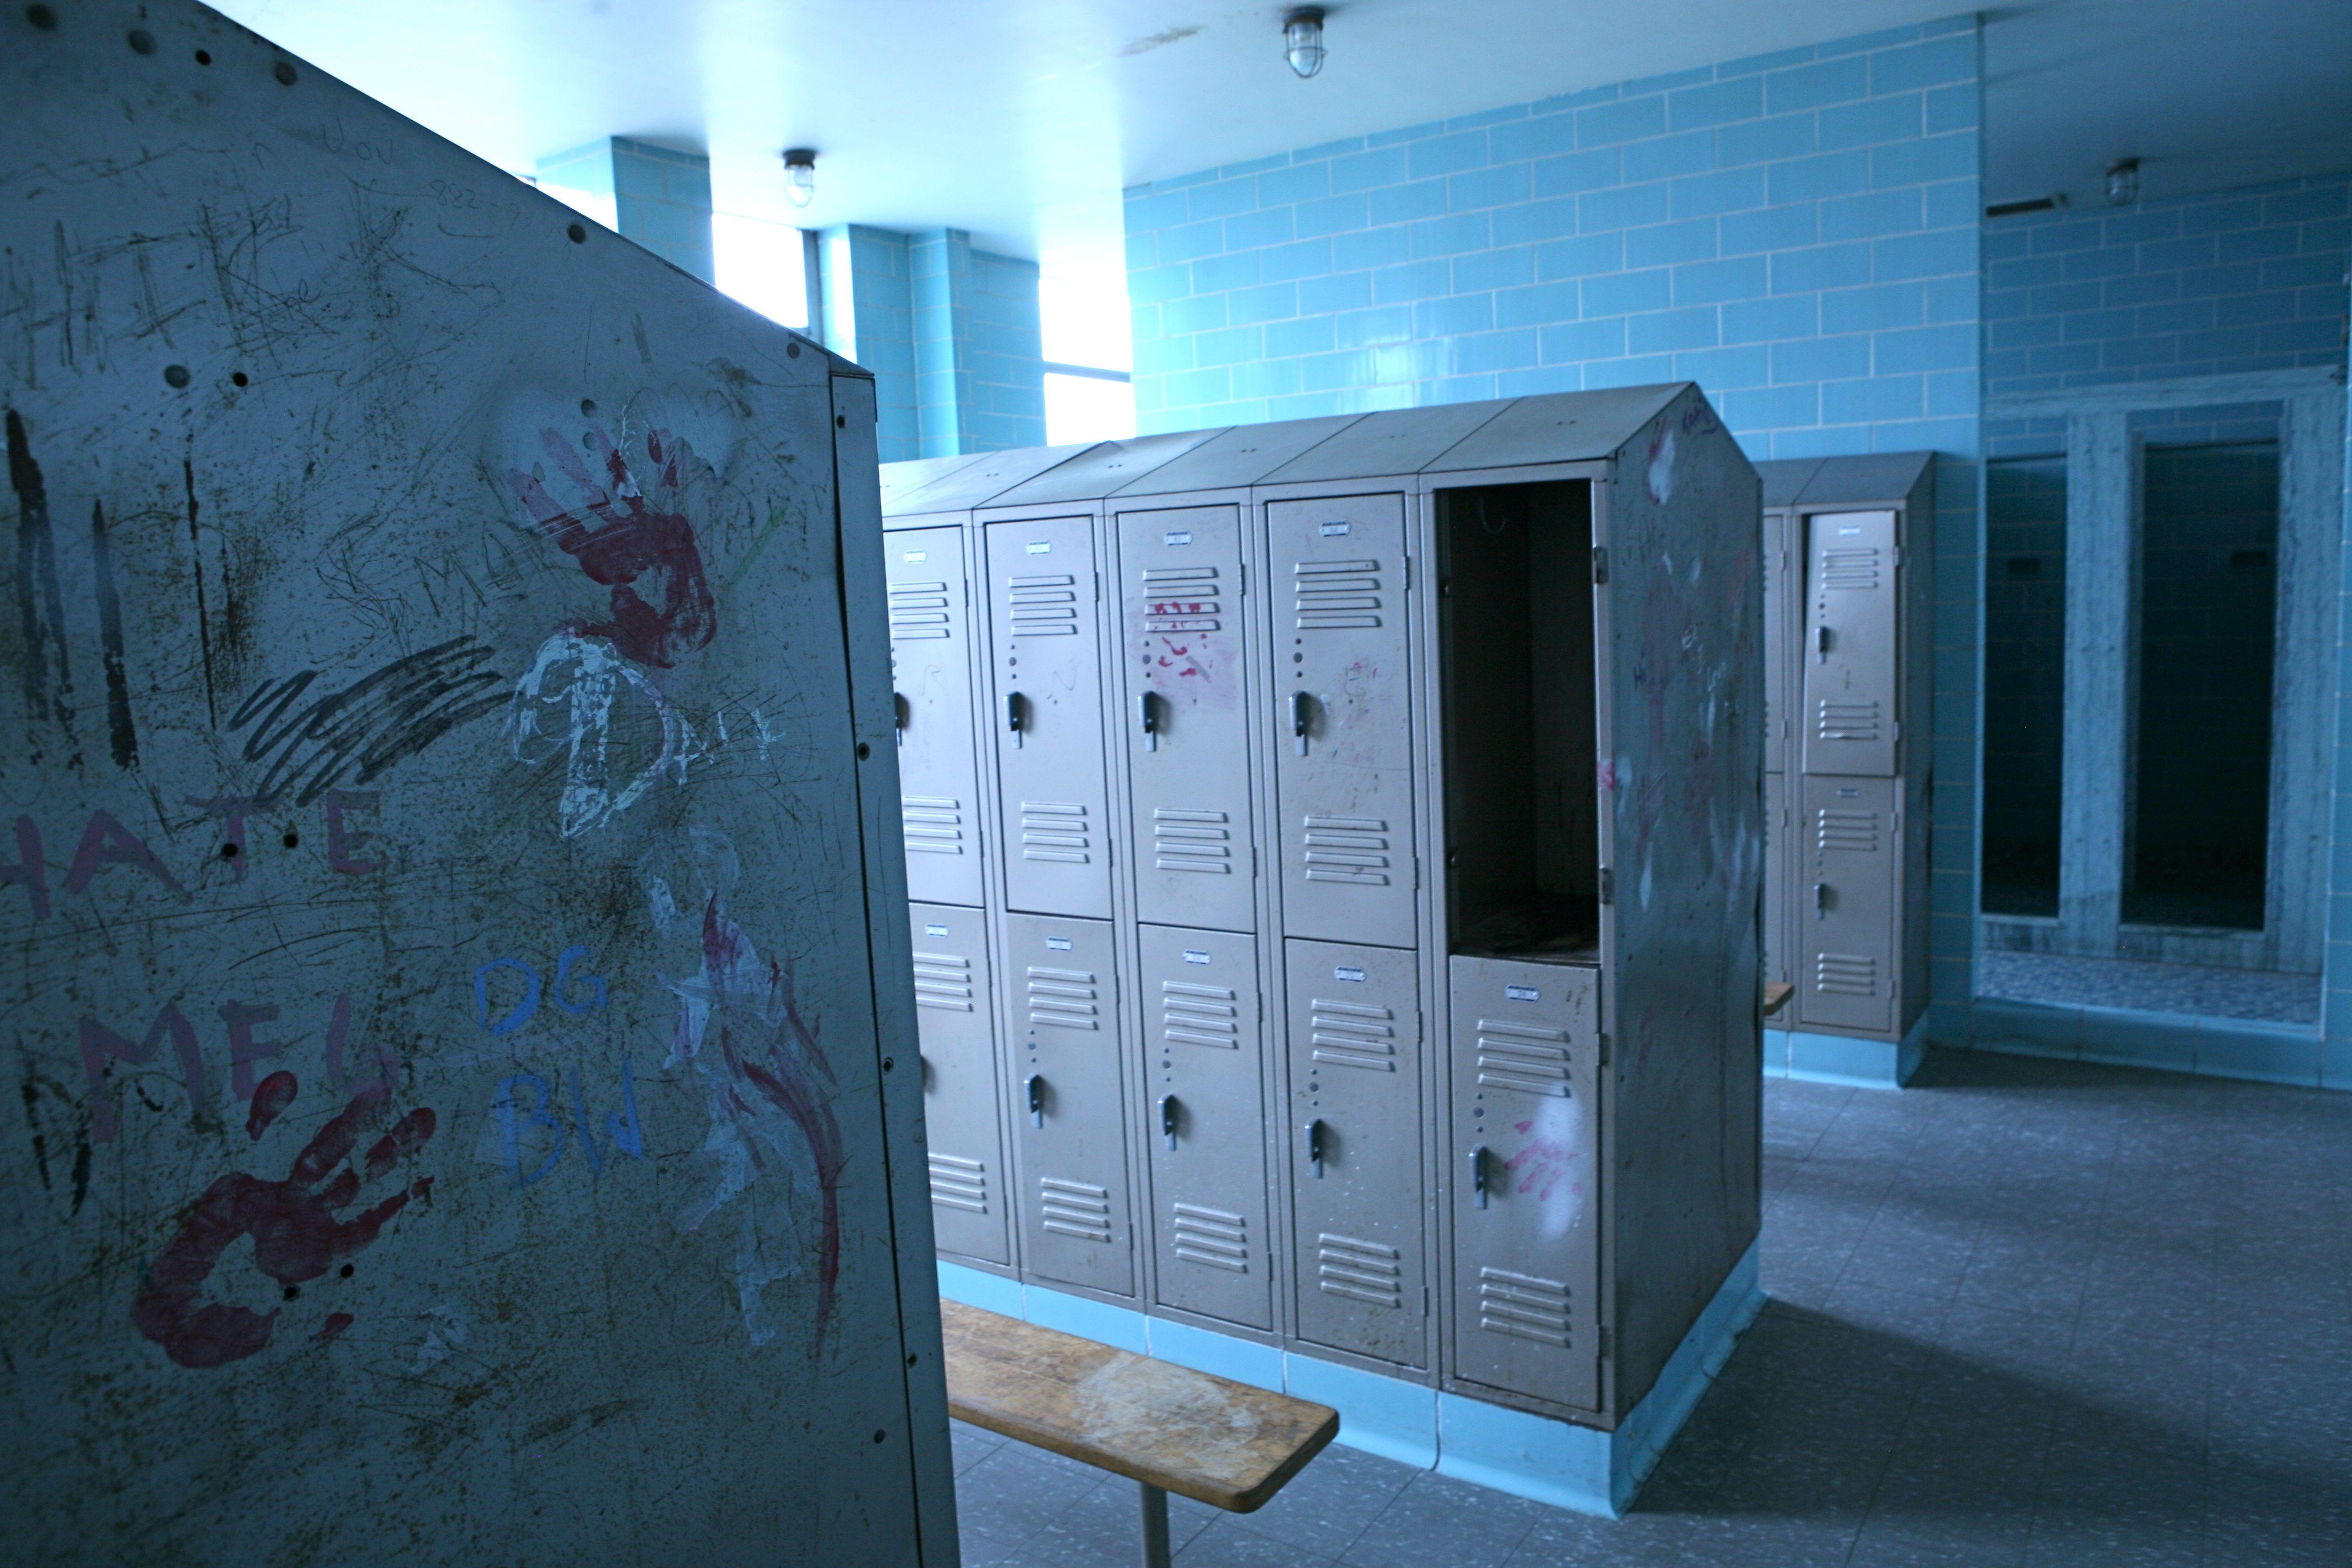 School Locker Room  Writing Assignment Prompt? U2013 Ruth E. Hendricks  Photography